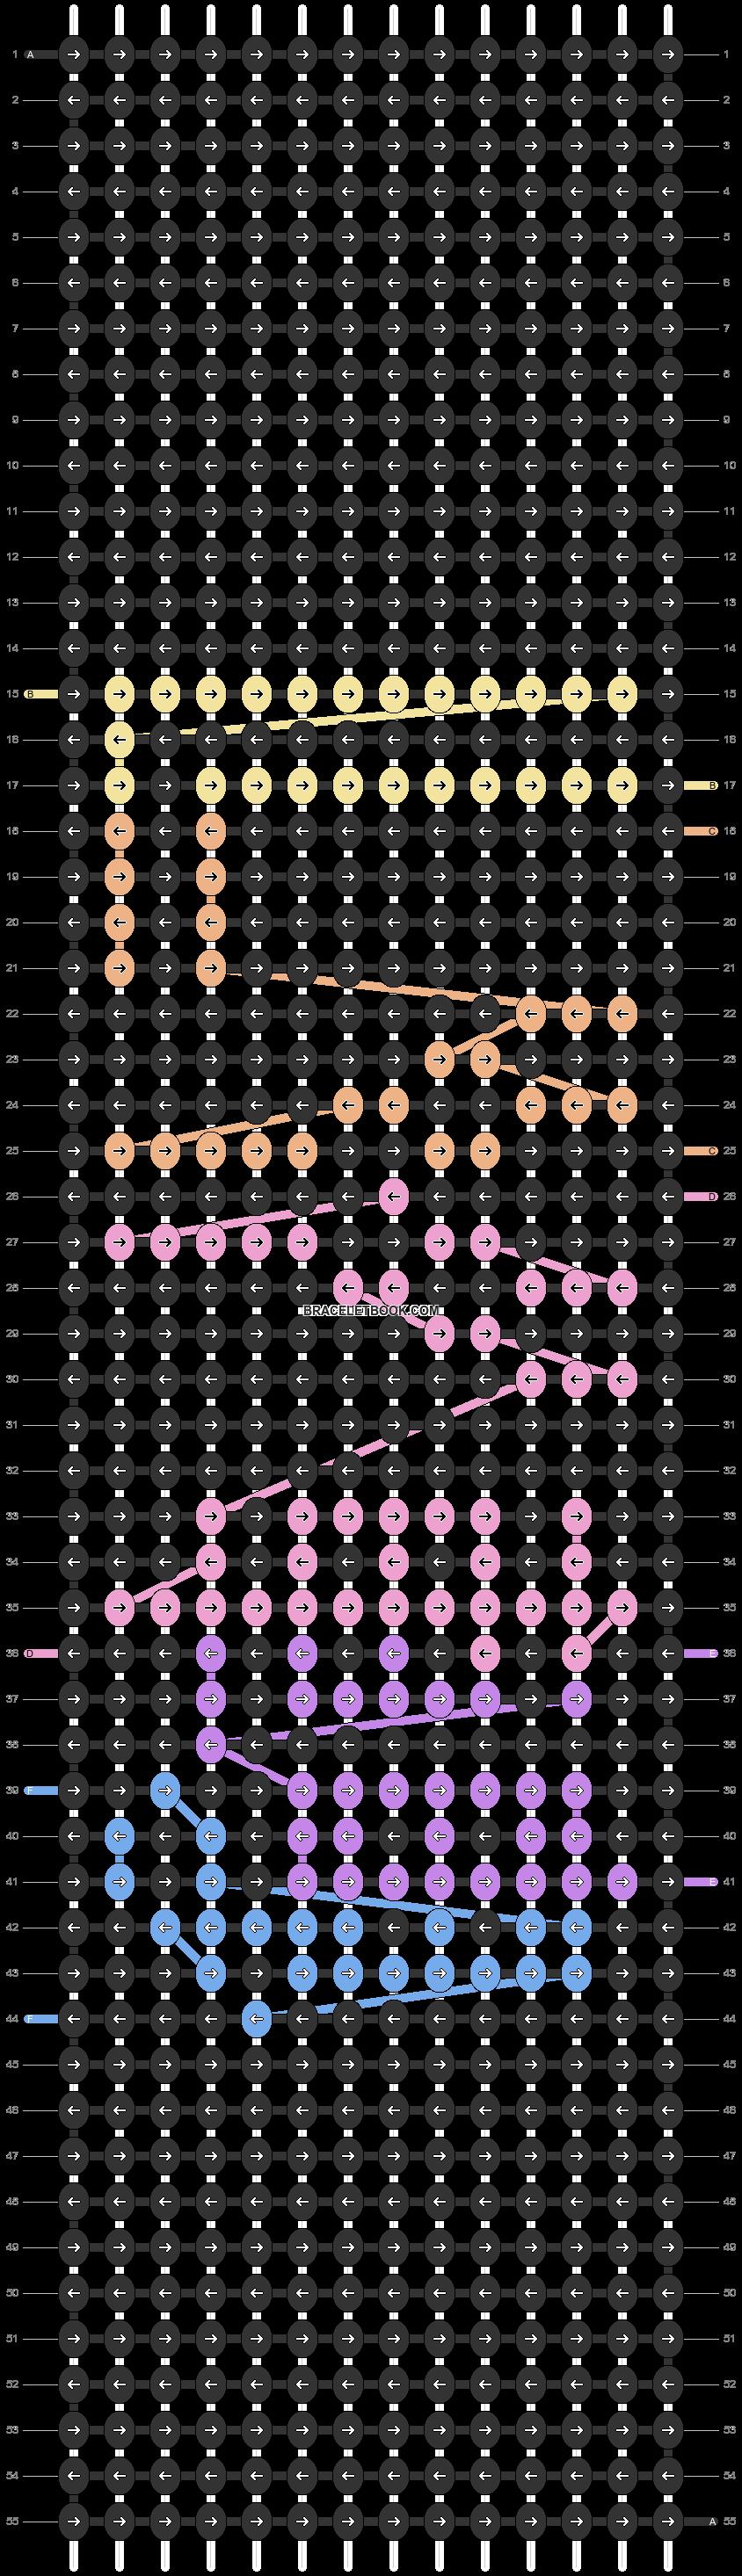 Alpha pattern #57084 pattern